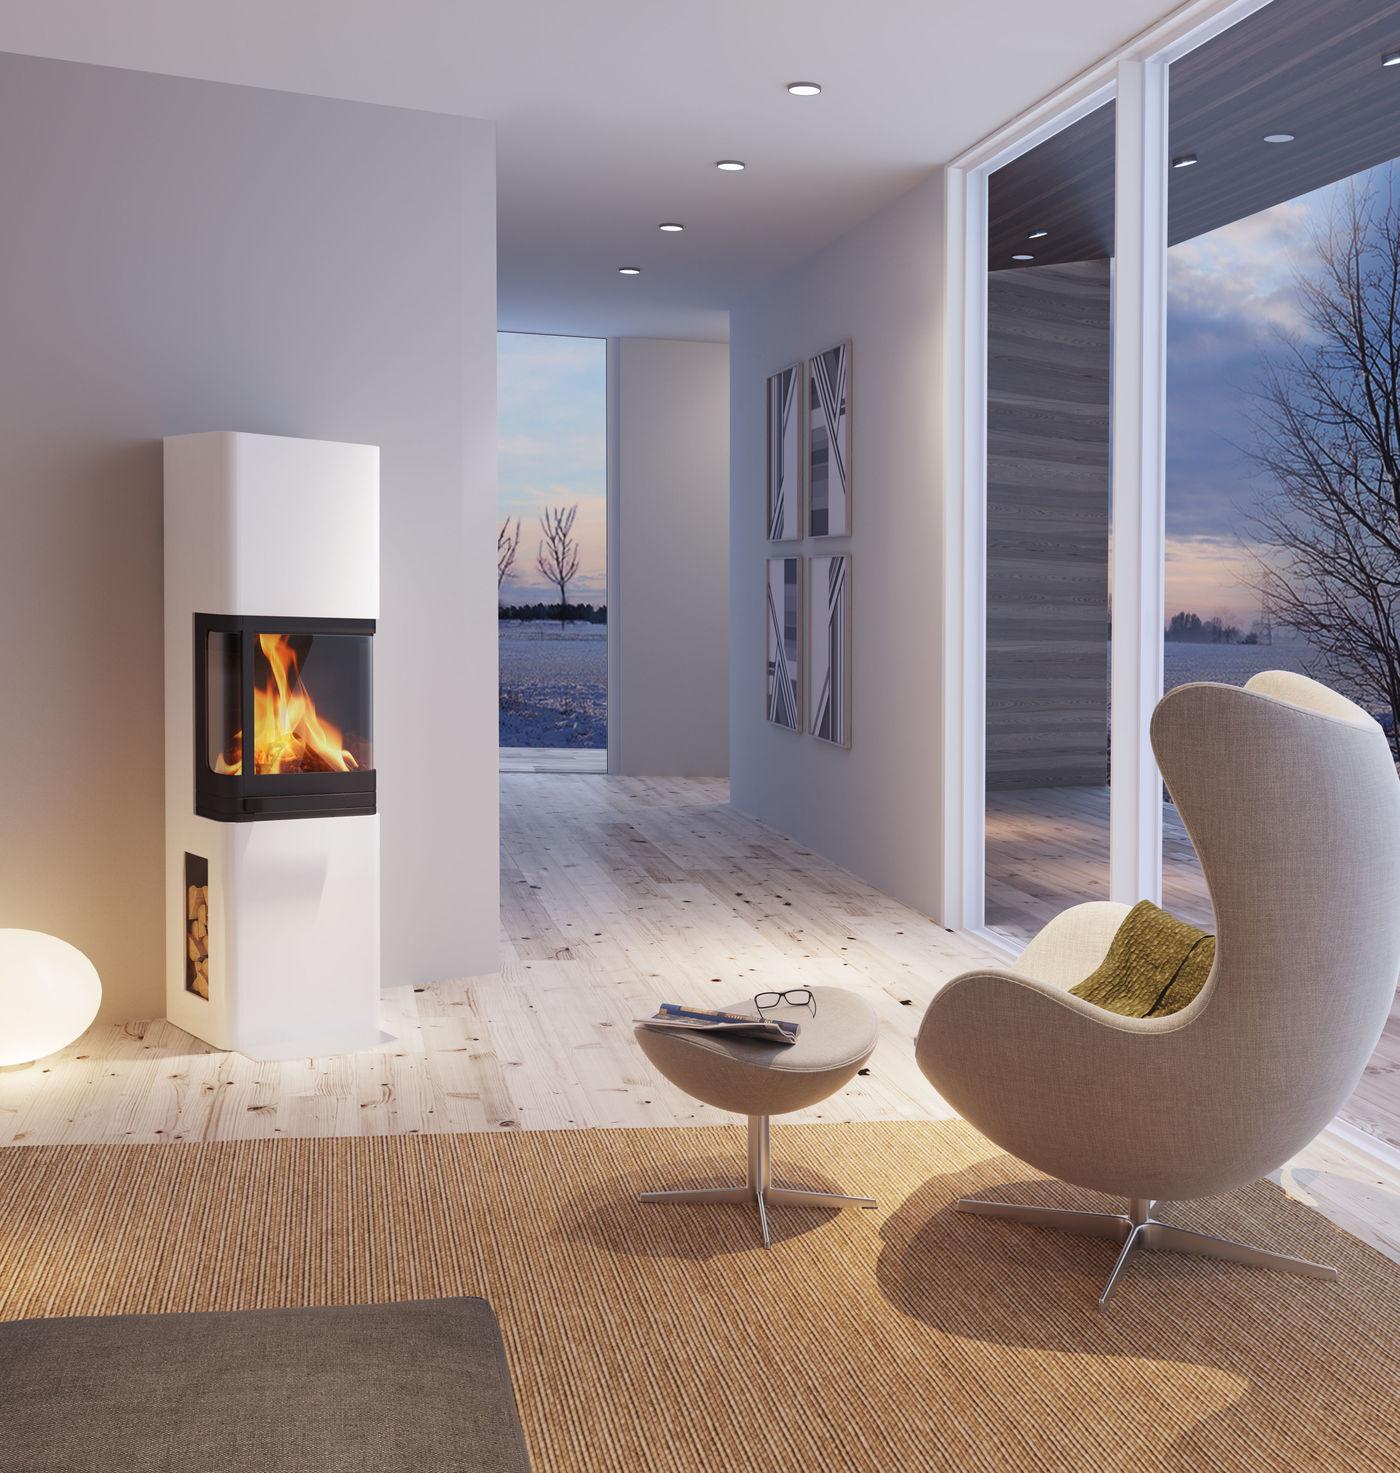 Cosy winter modern scene evening